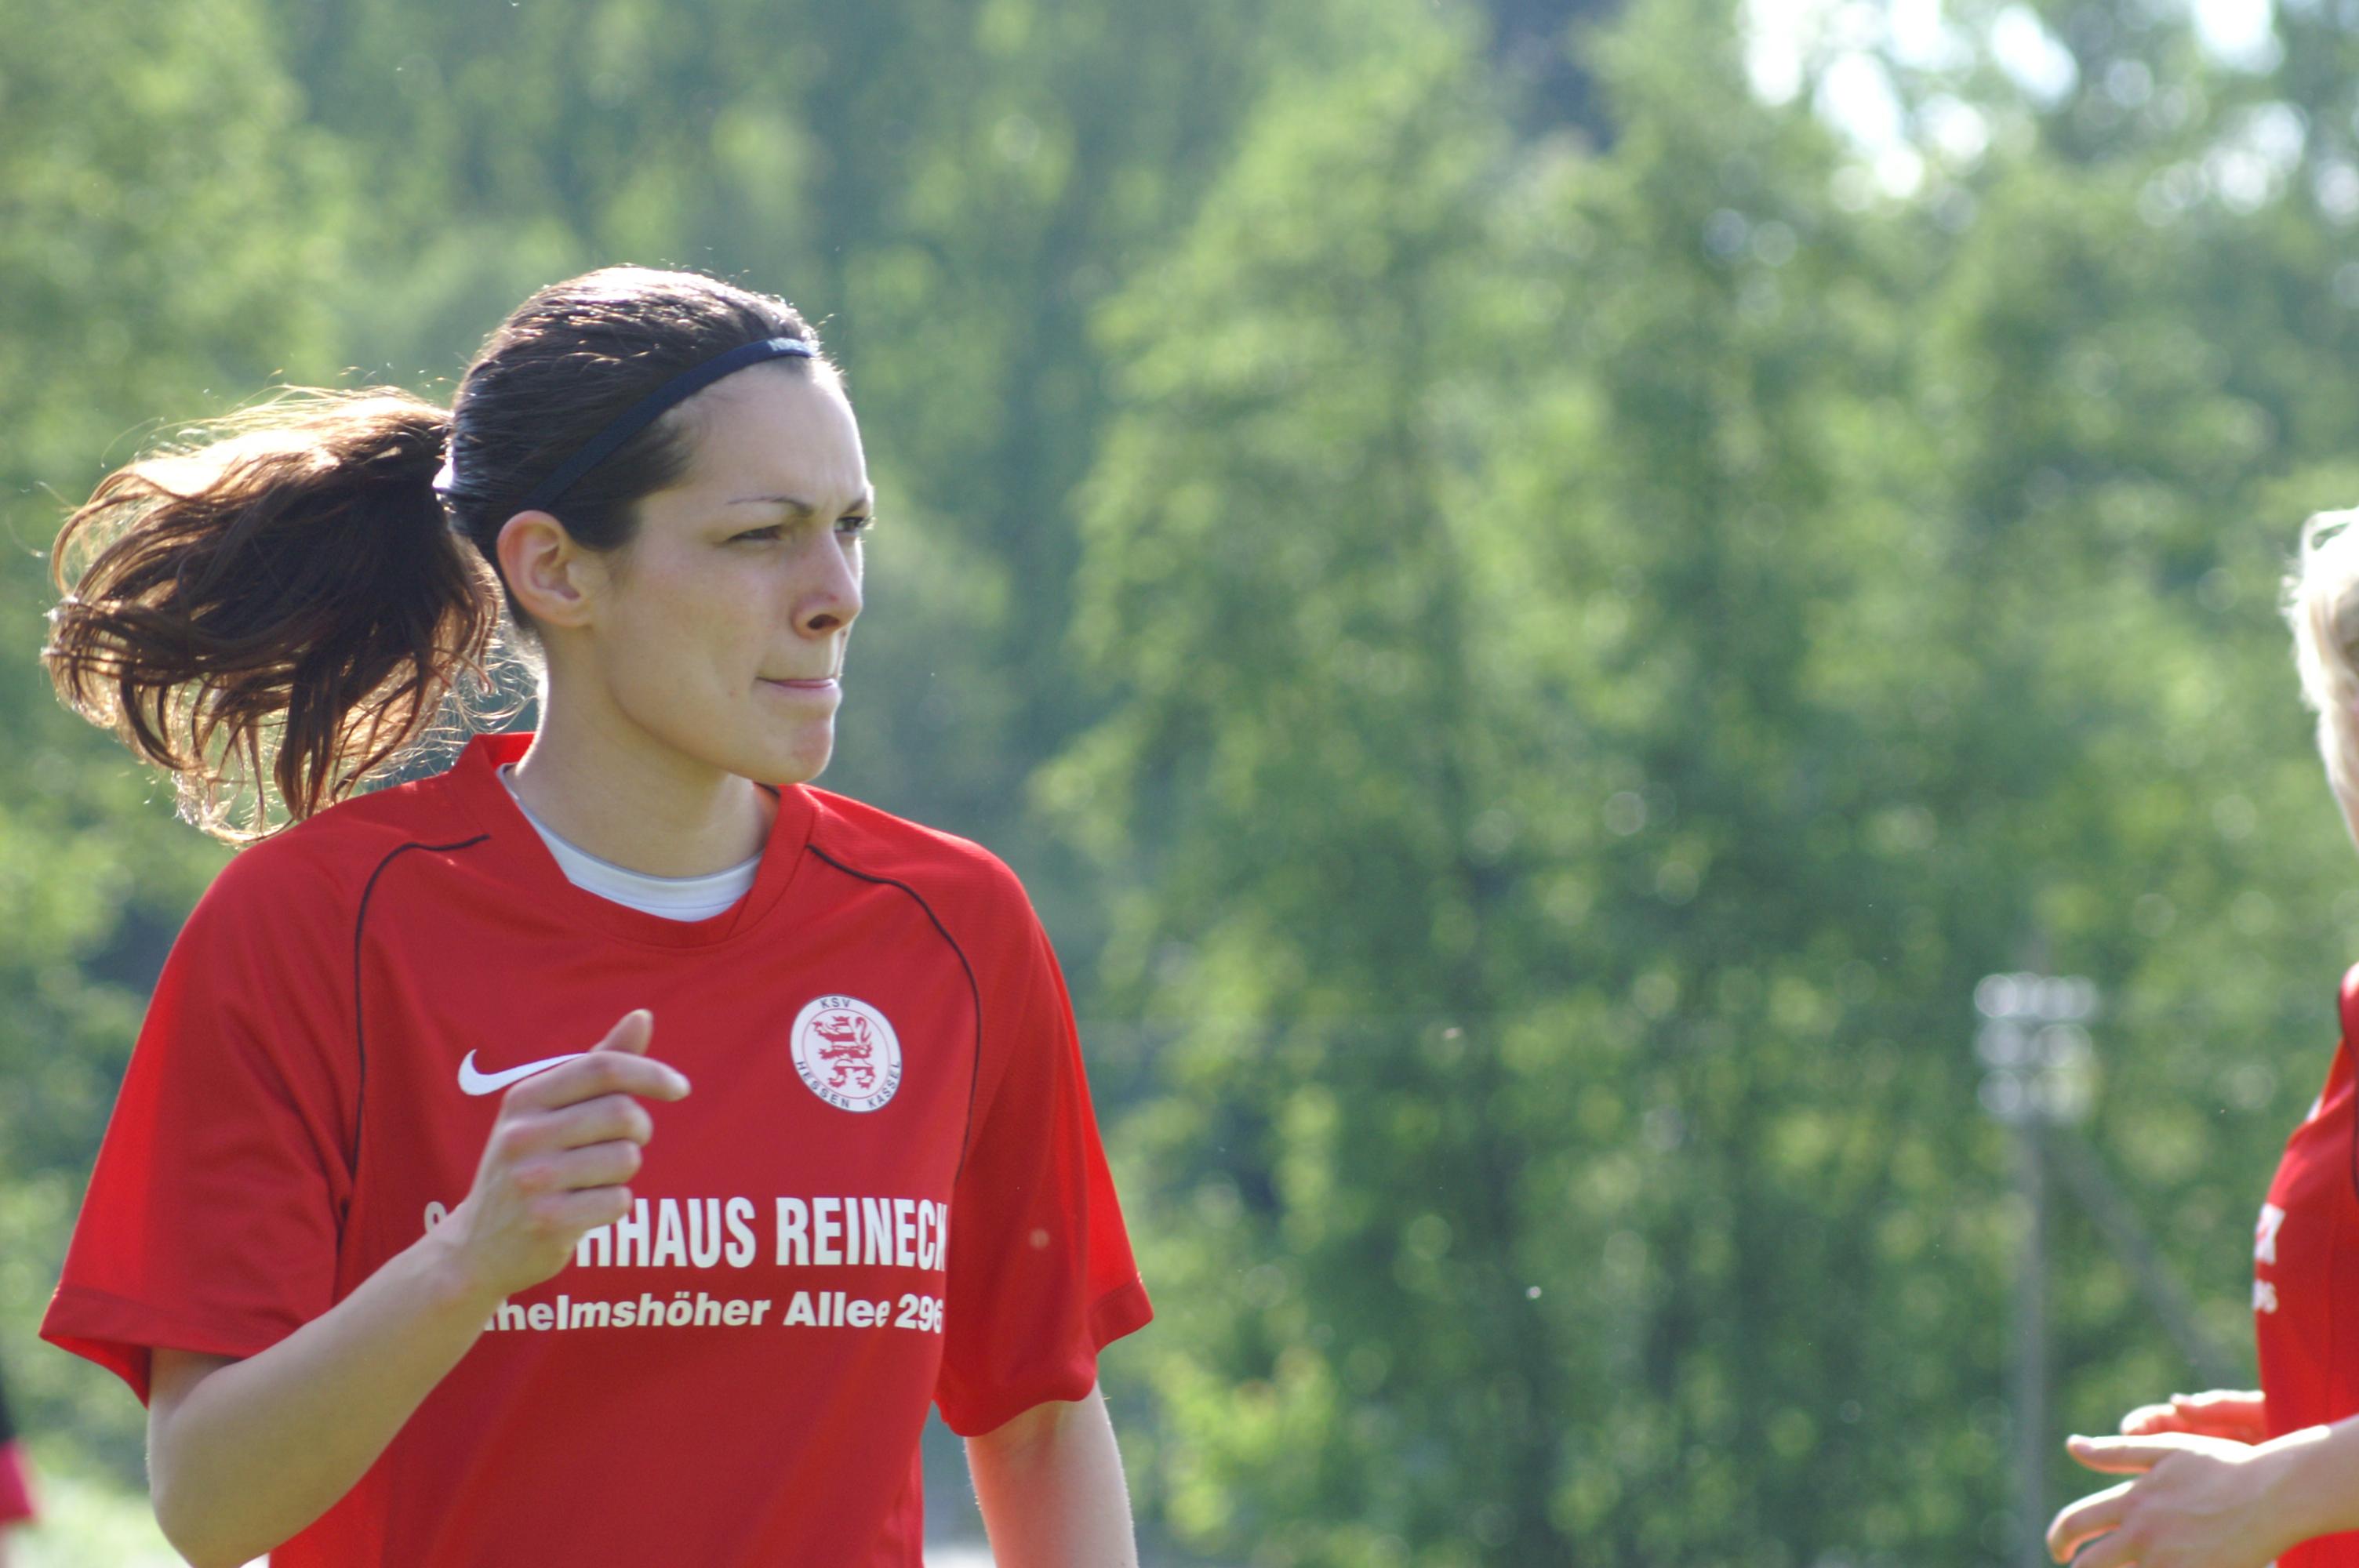 FSV Friedensdorf - KSV Hessen Frauen 2:1 (0:1): Lisa Lattermann